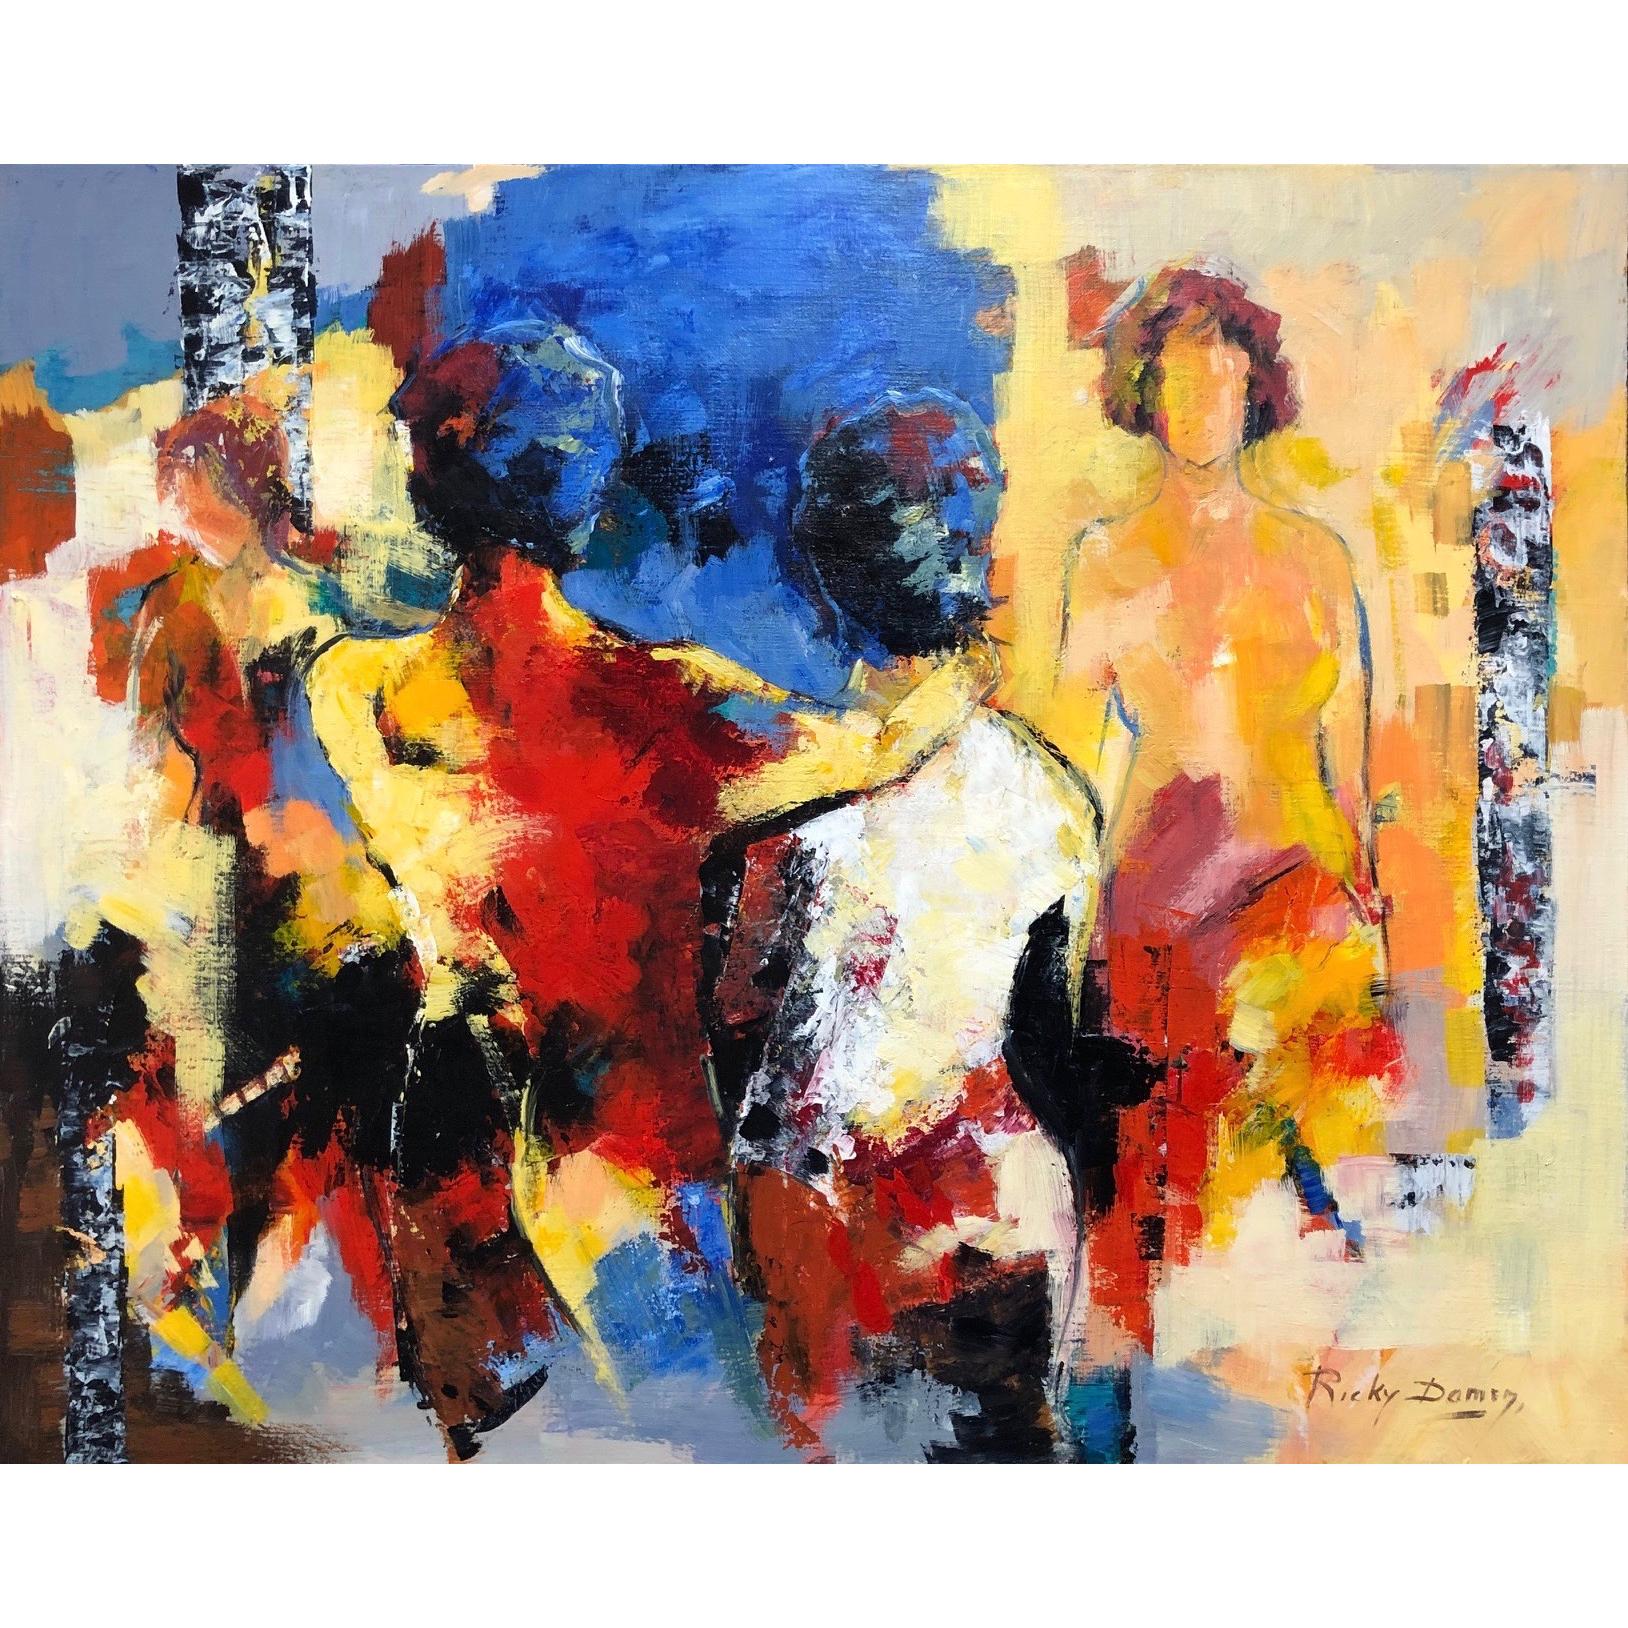 Ricky Damen schilderij 'De Familie'